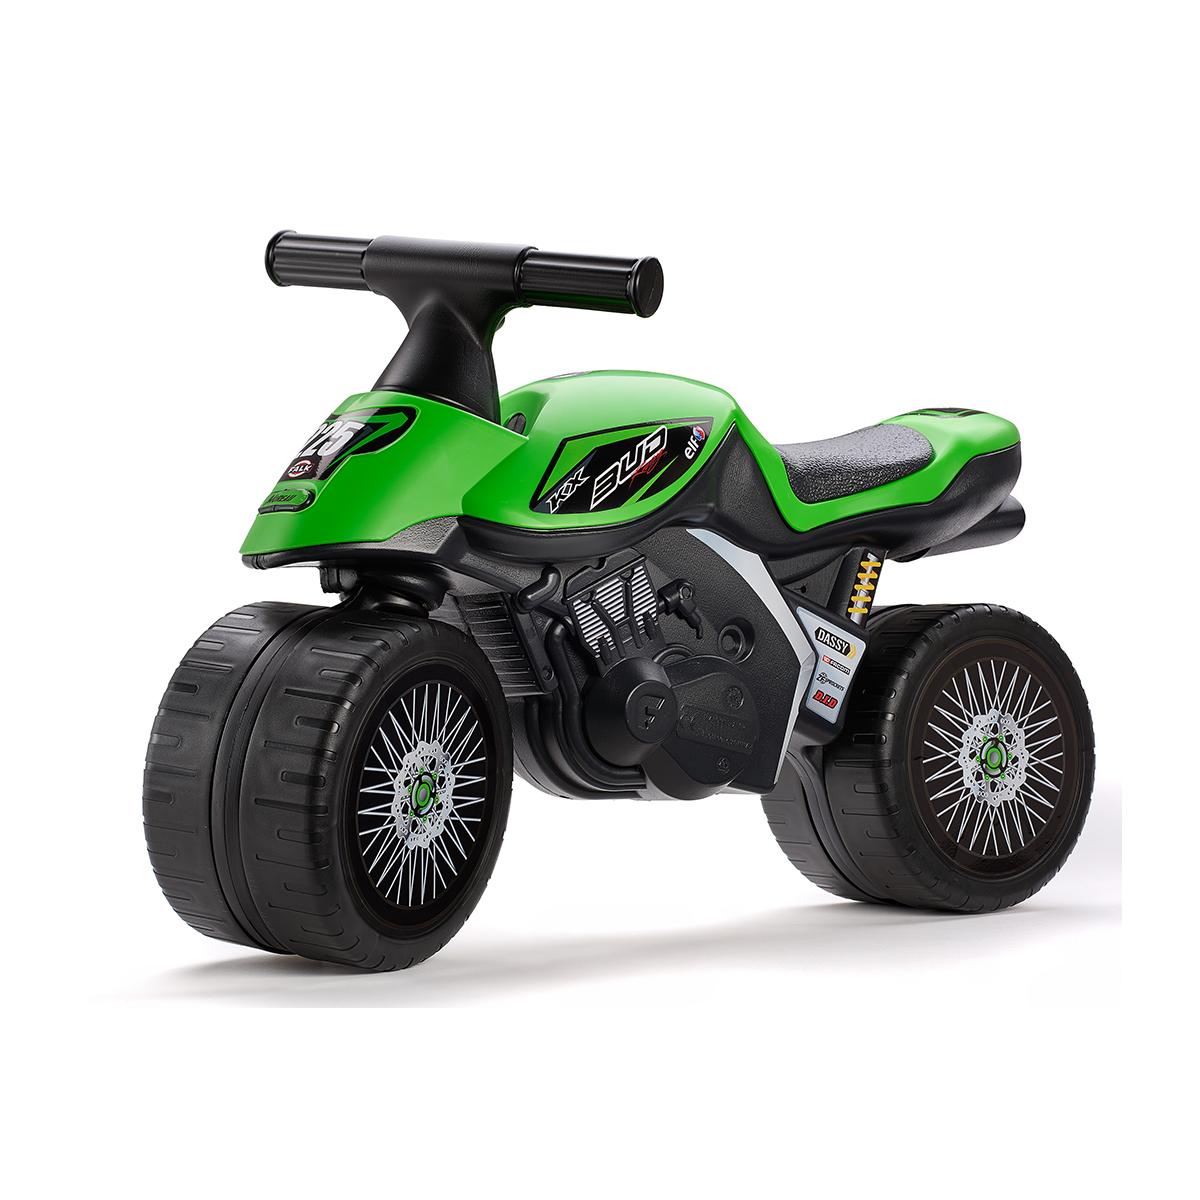 Porteur Falk Baby Moto Kawasaki Bud Racing - Vert